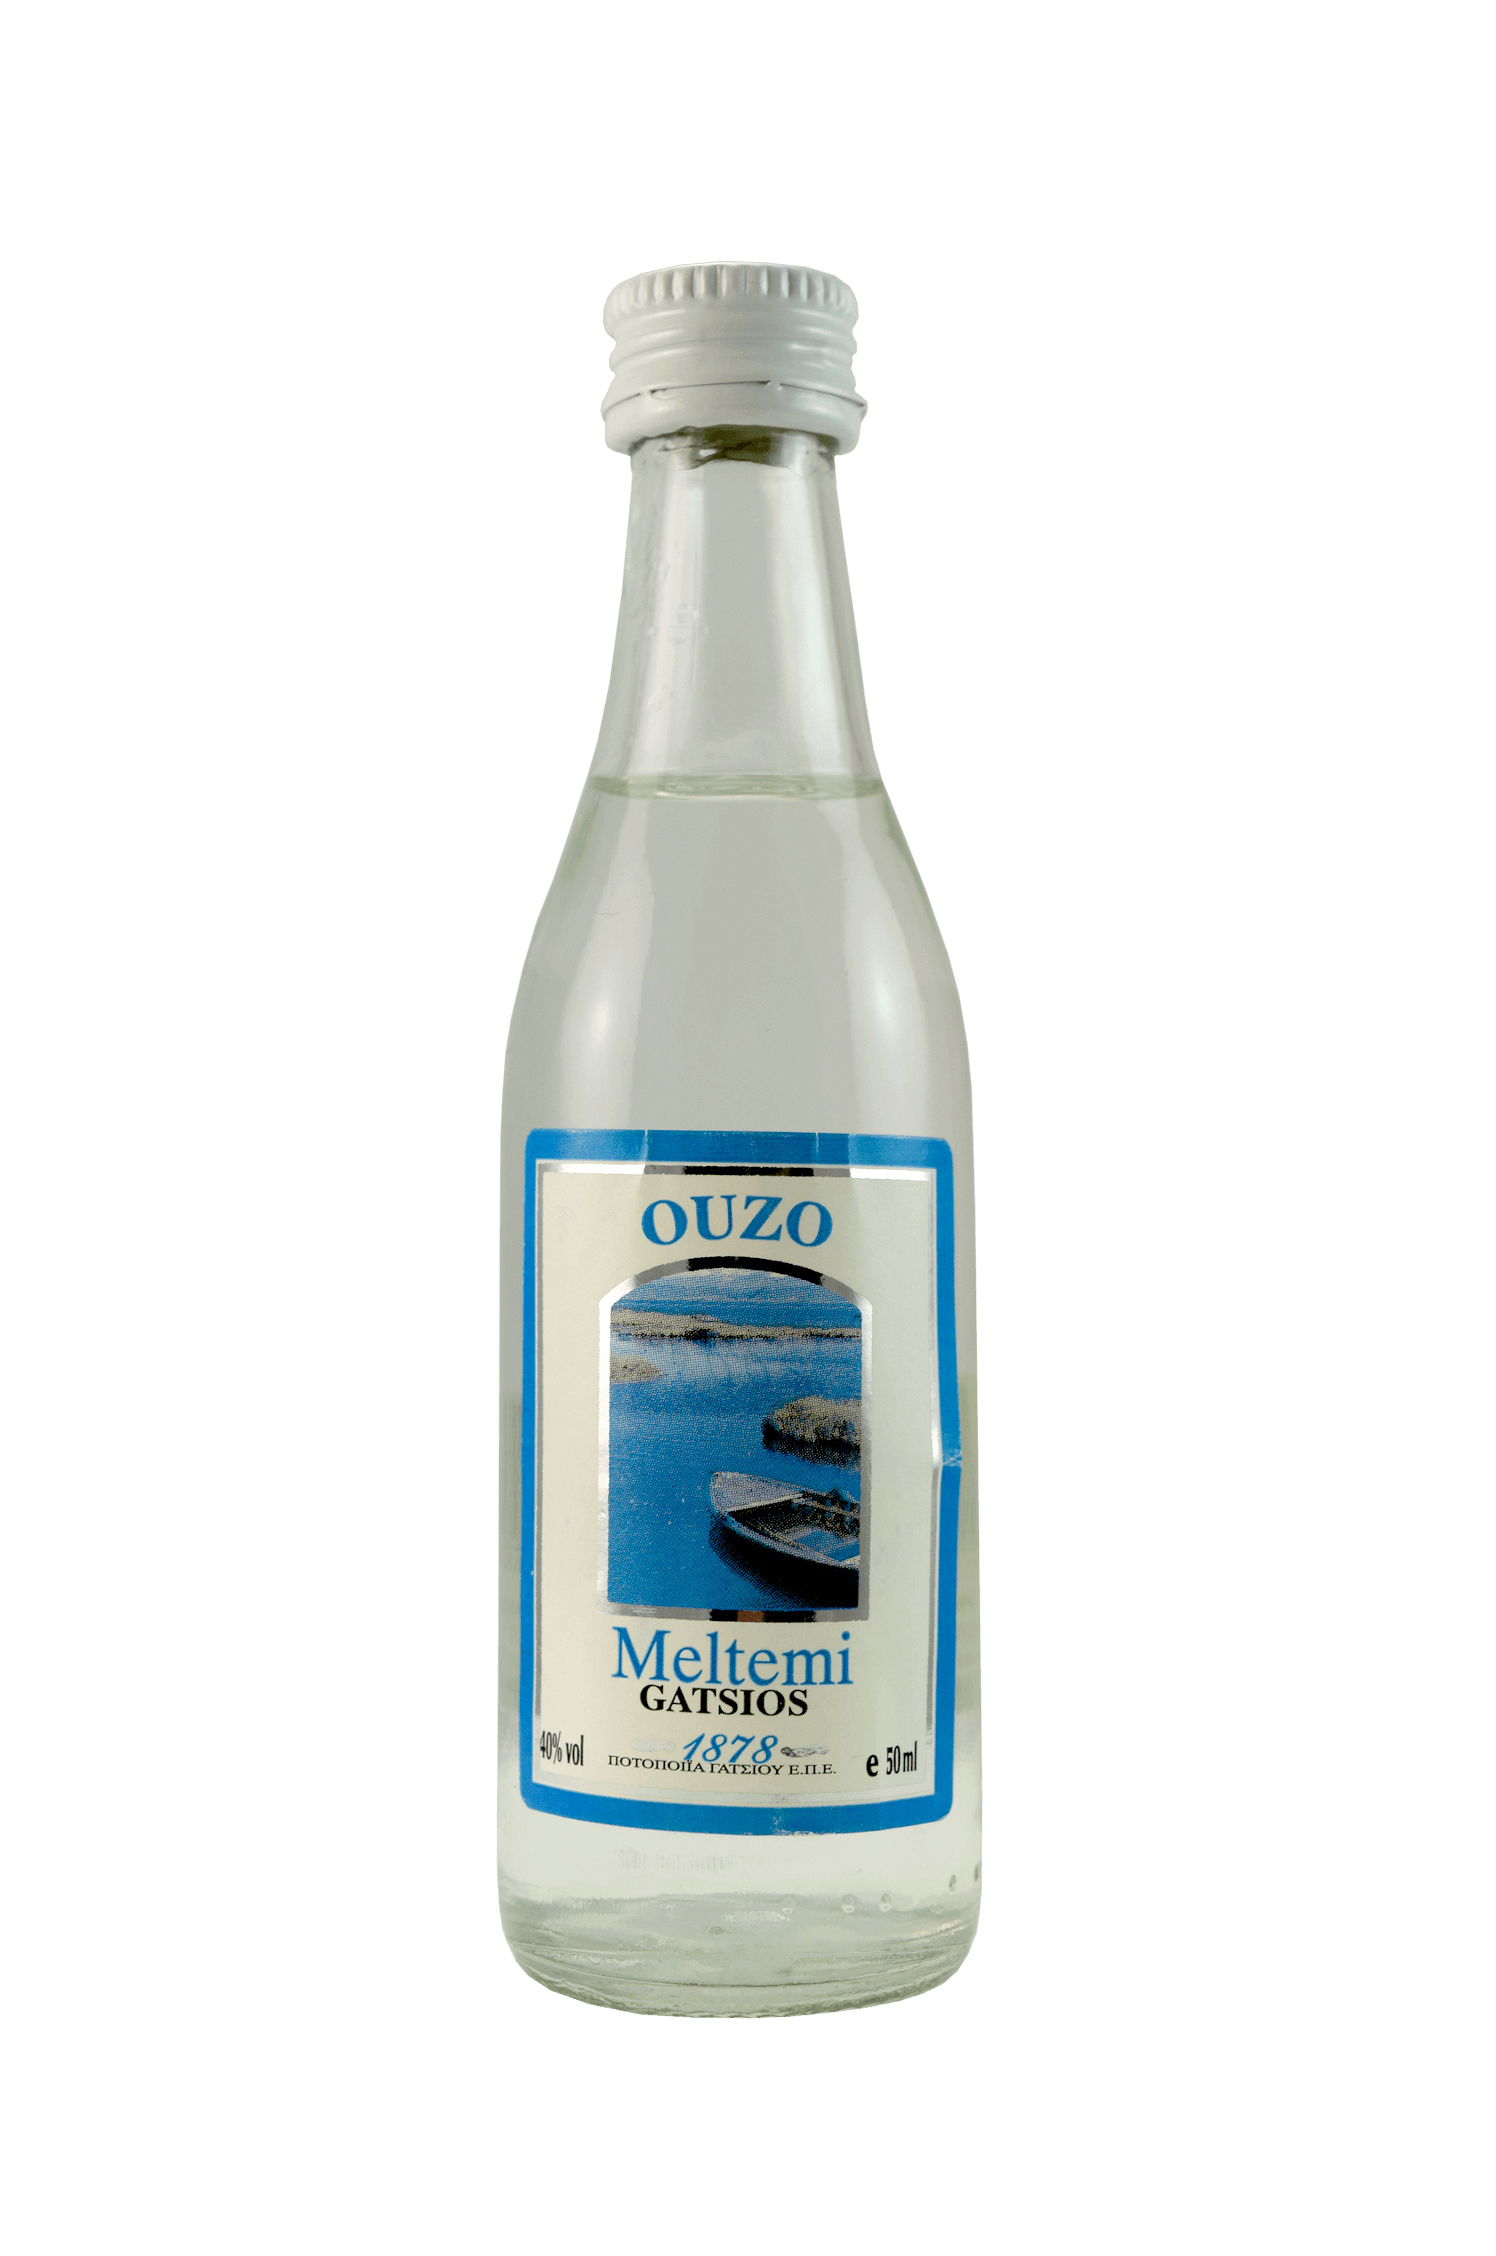 Ouzo Meltemi Gatsios